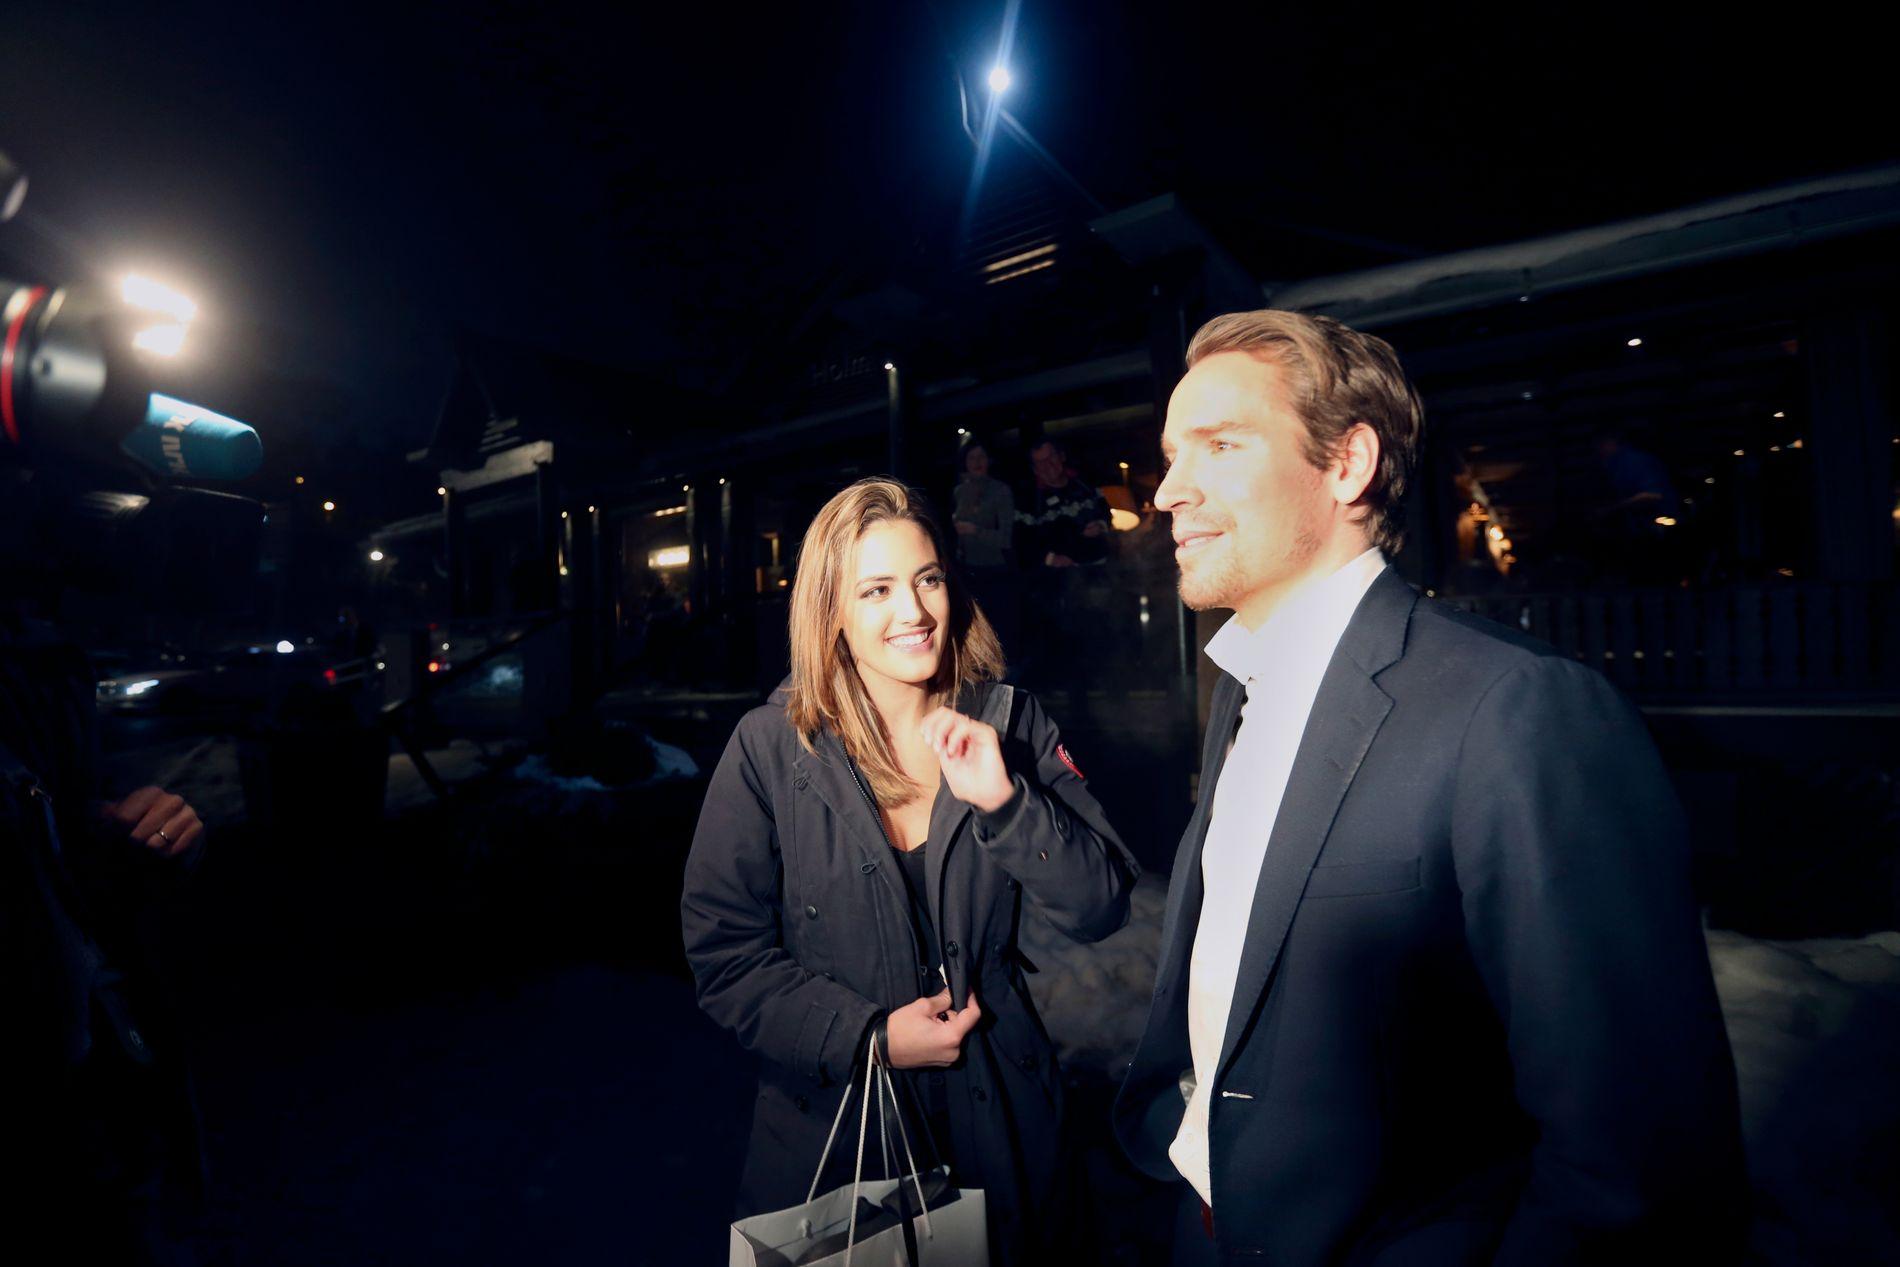 GIFTEKLARE: Emil Hegle Svendsen og Samantha Skogrand, her fra bankett i forbindelse med Skiskytter-VM i Oslo tidligere i år.